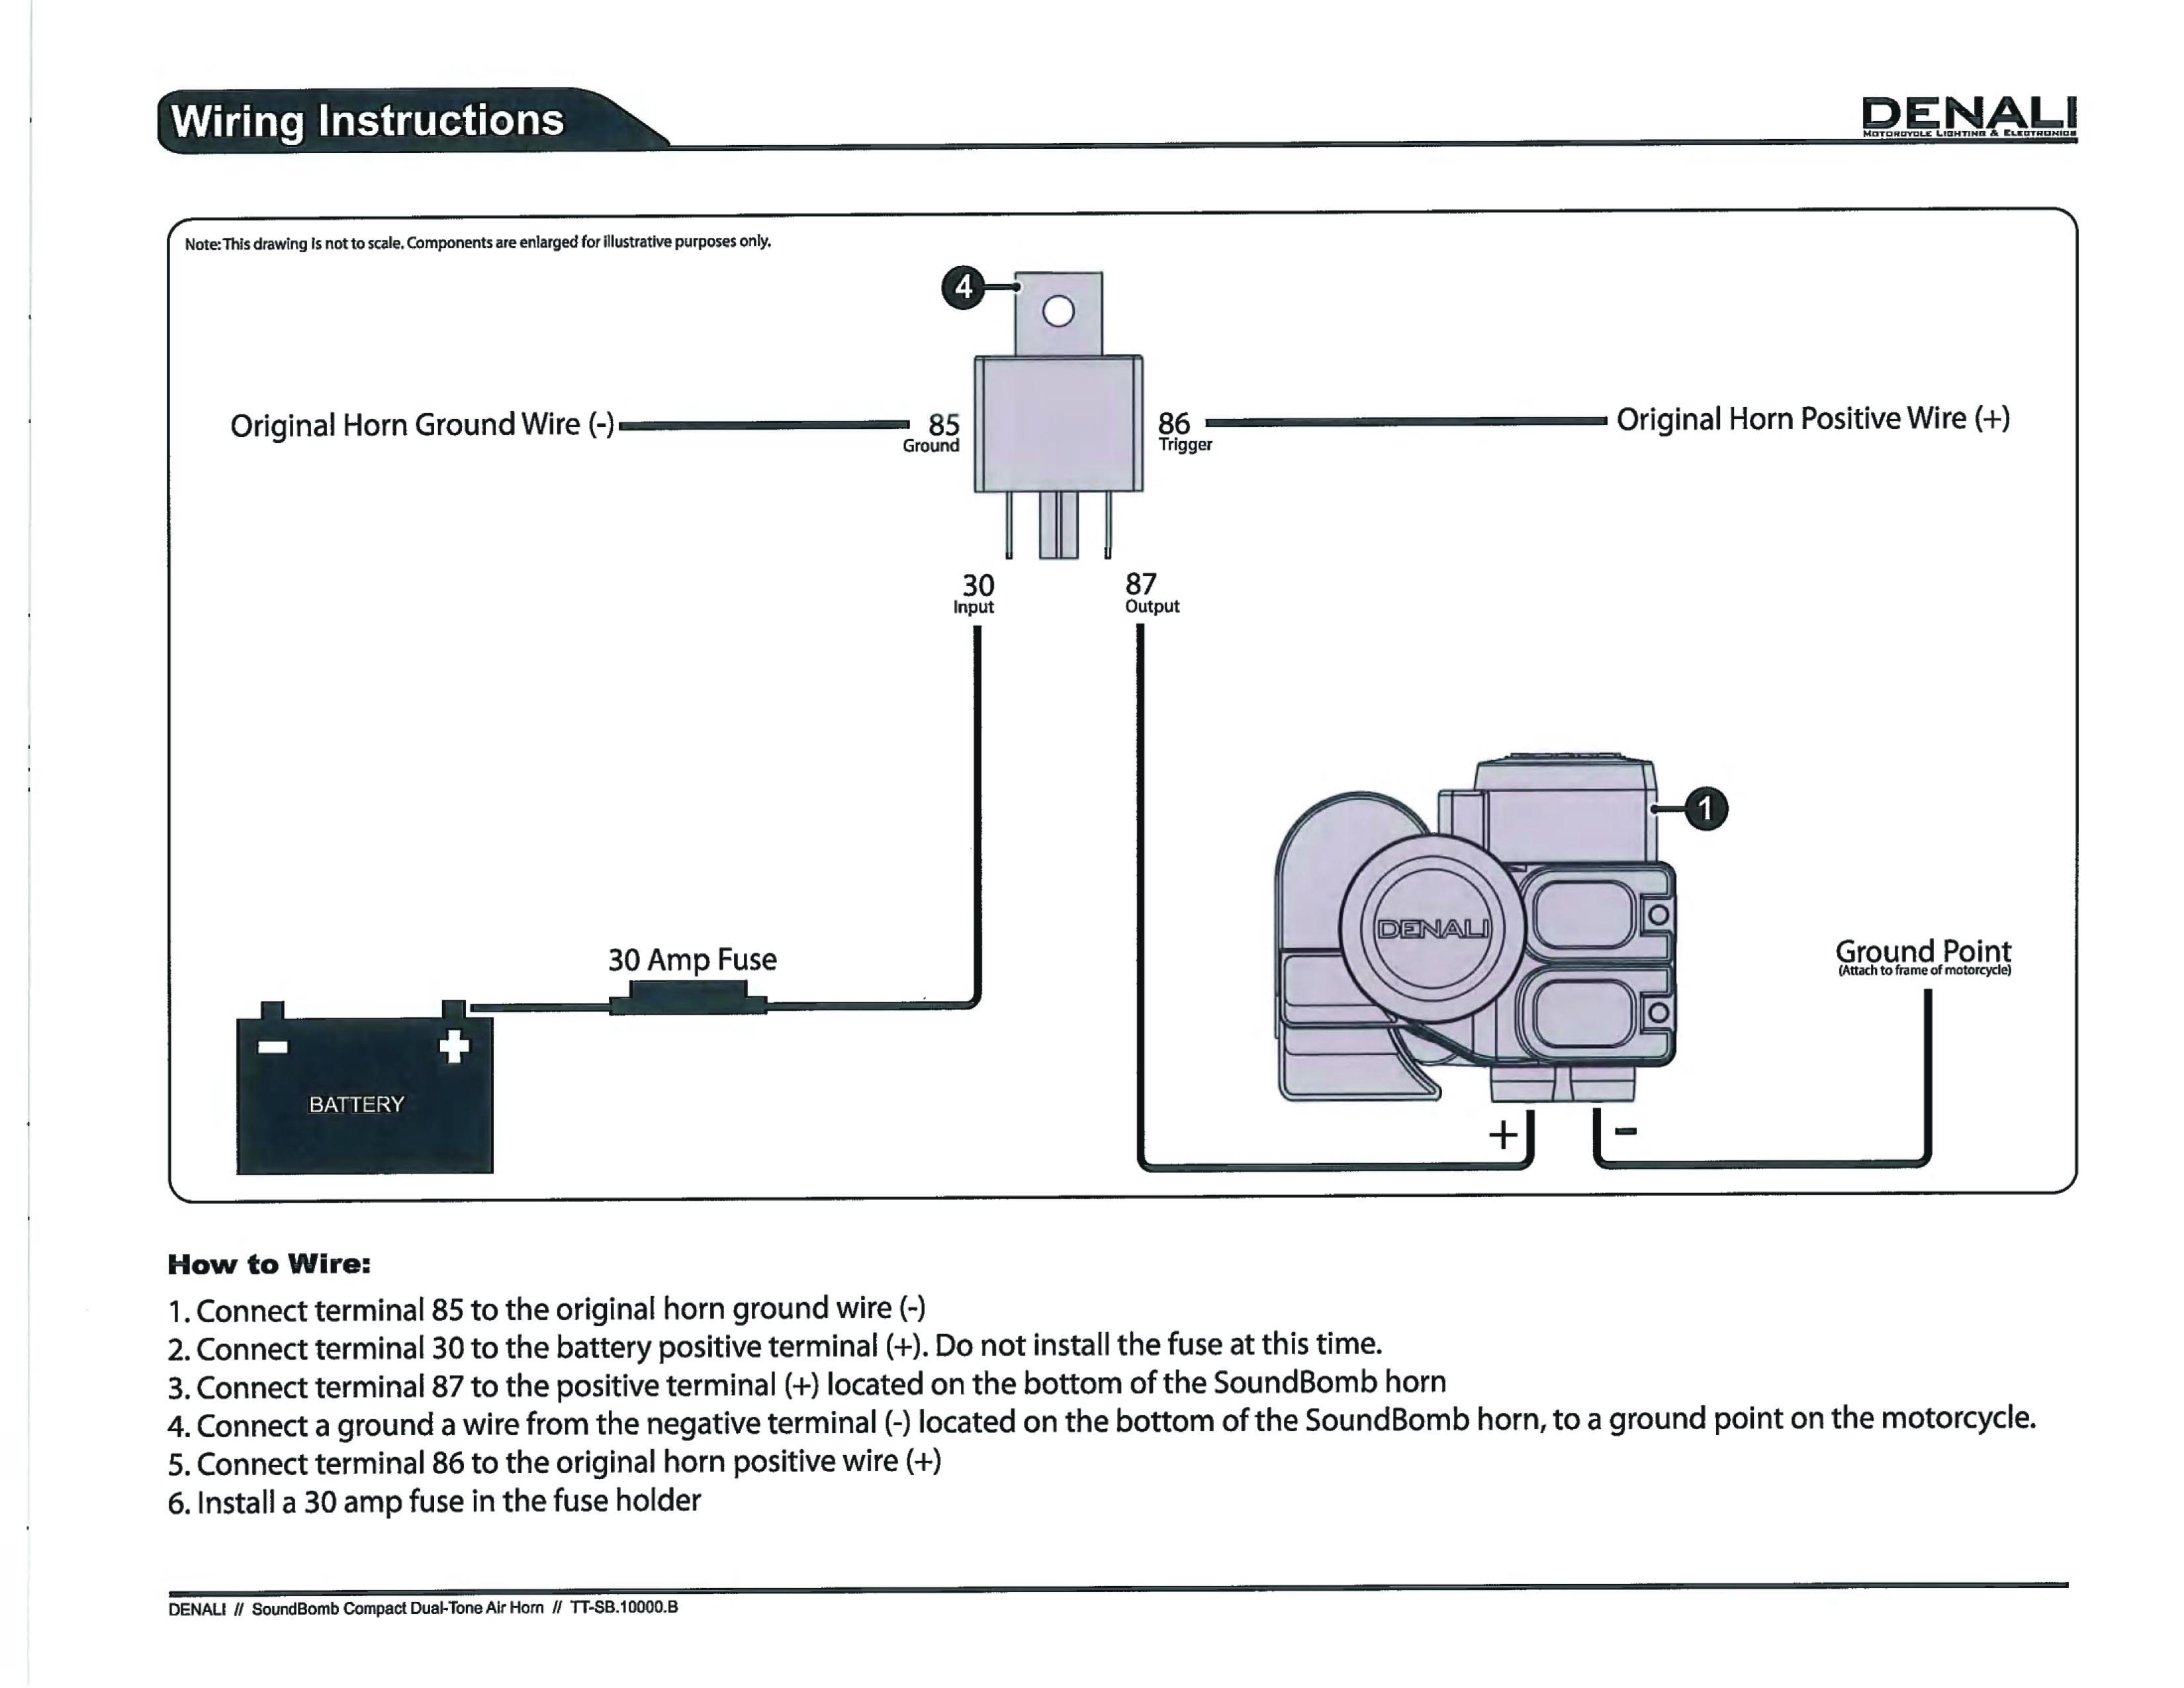 Denali Sound Bomb Install on 2017 SDGT | KTM ForumsKTM Forums